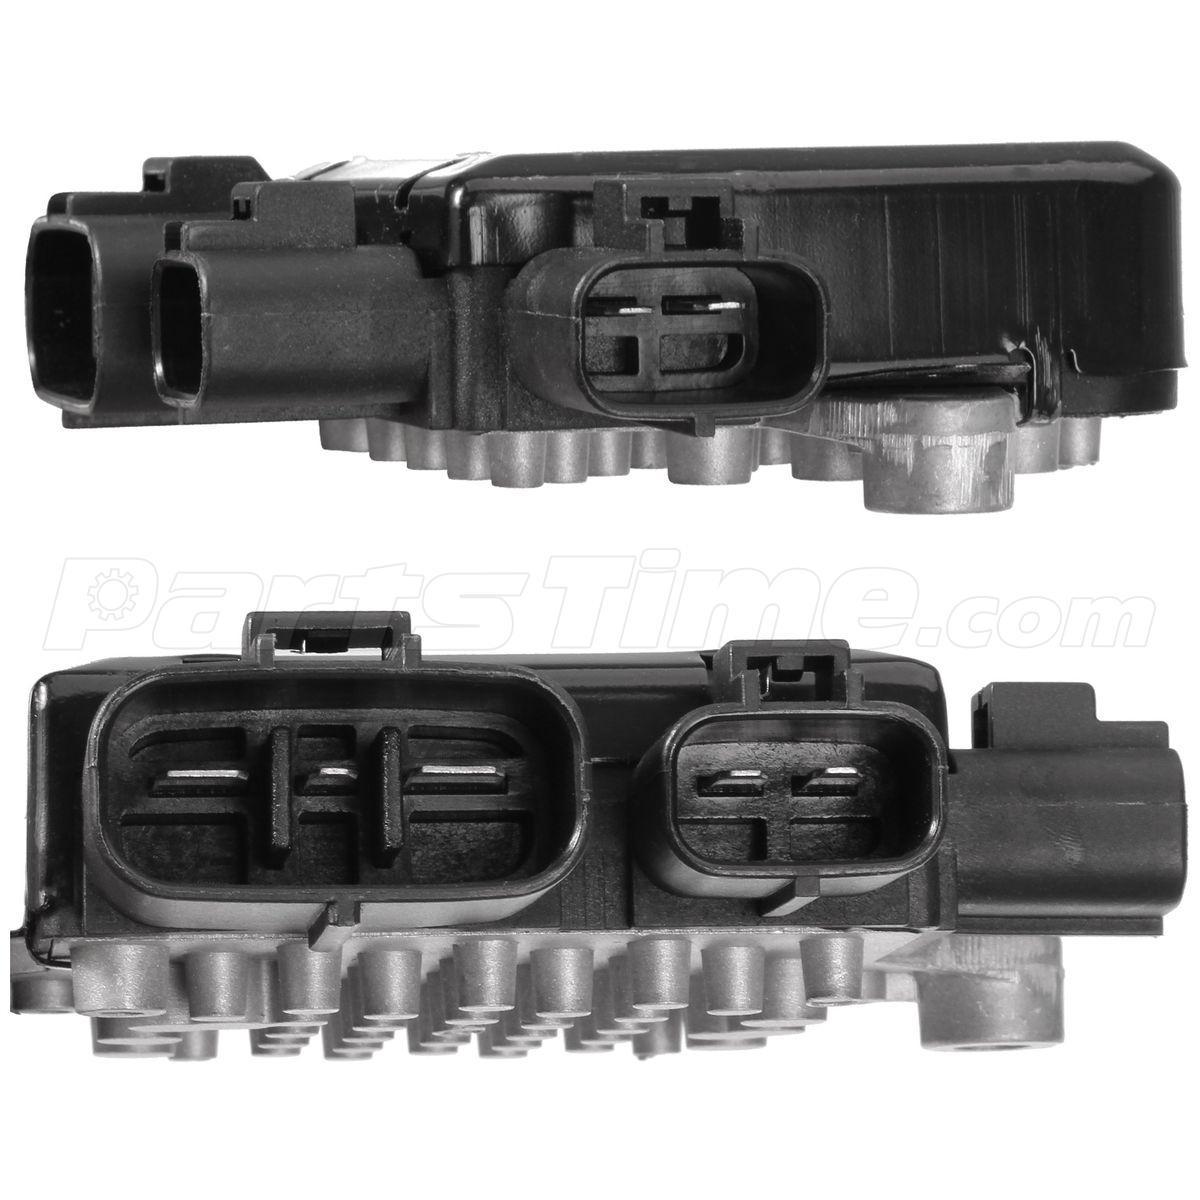 2003 Mazda Mpv Fan Control Module Wiring Diagram Free Download Engine Bay Cooling Controller Mitsubishi Outlander Radiator Bumper At